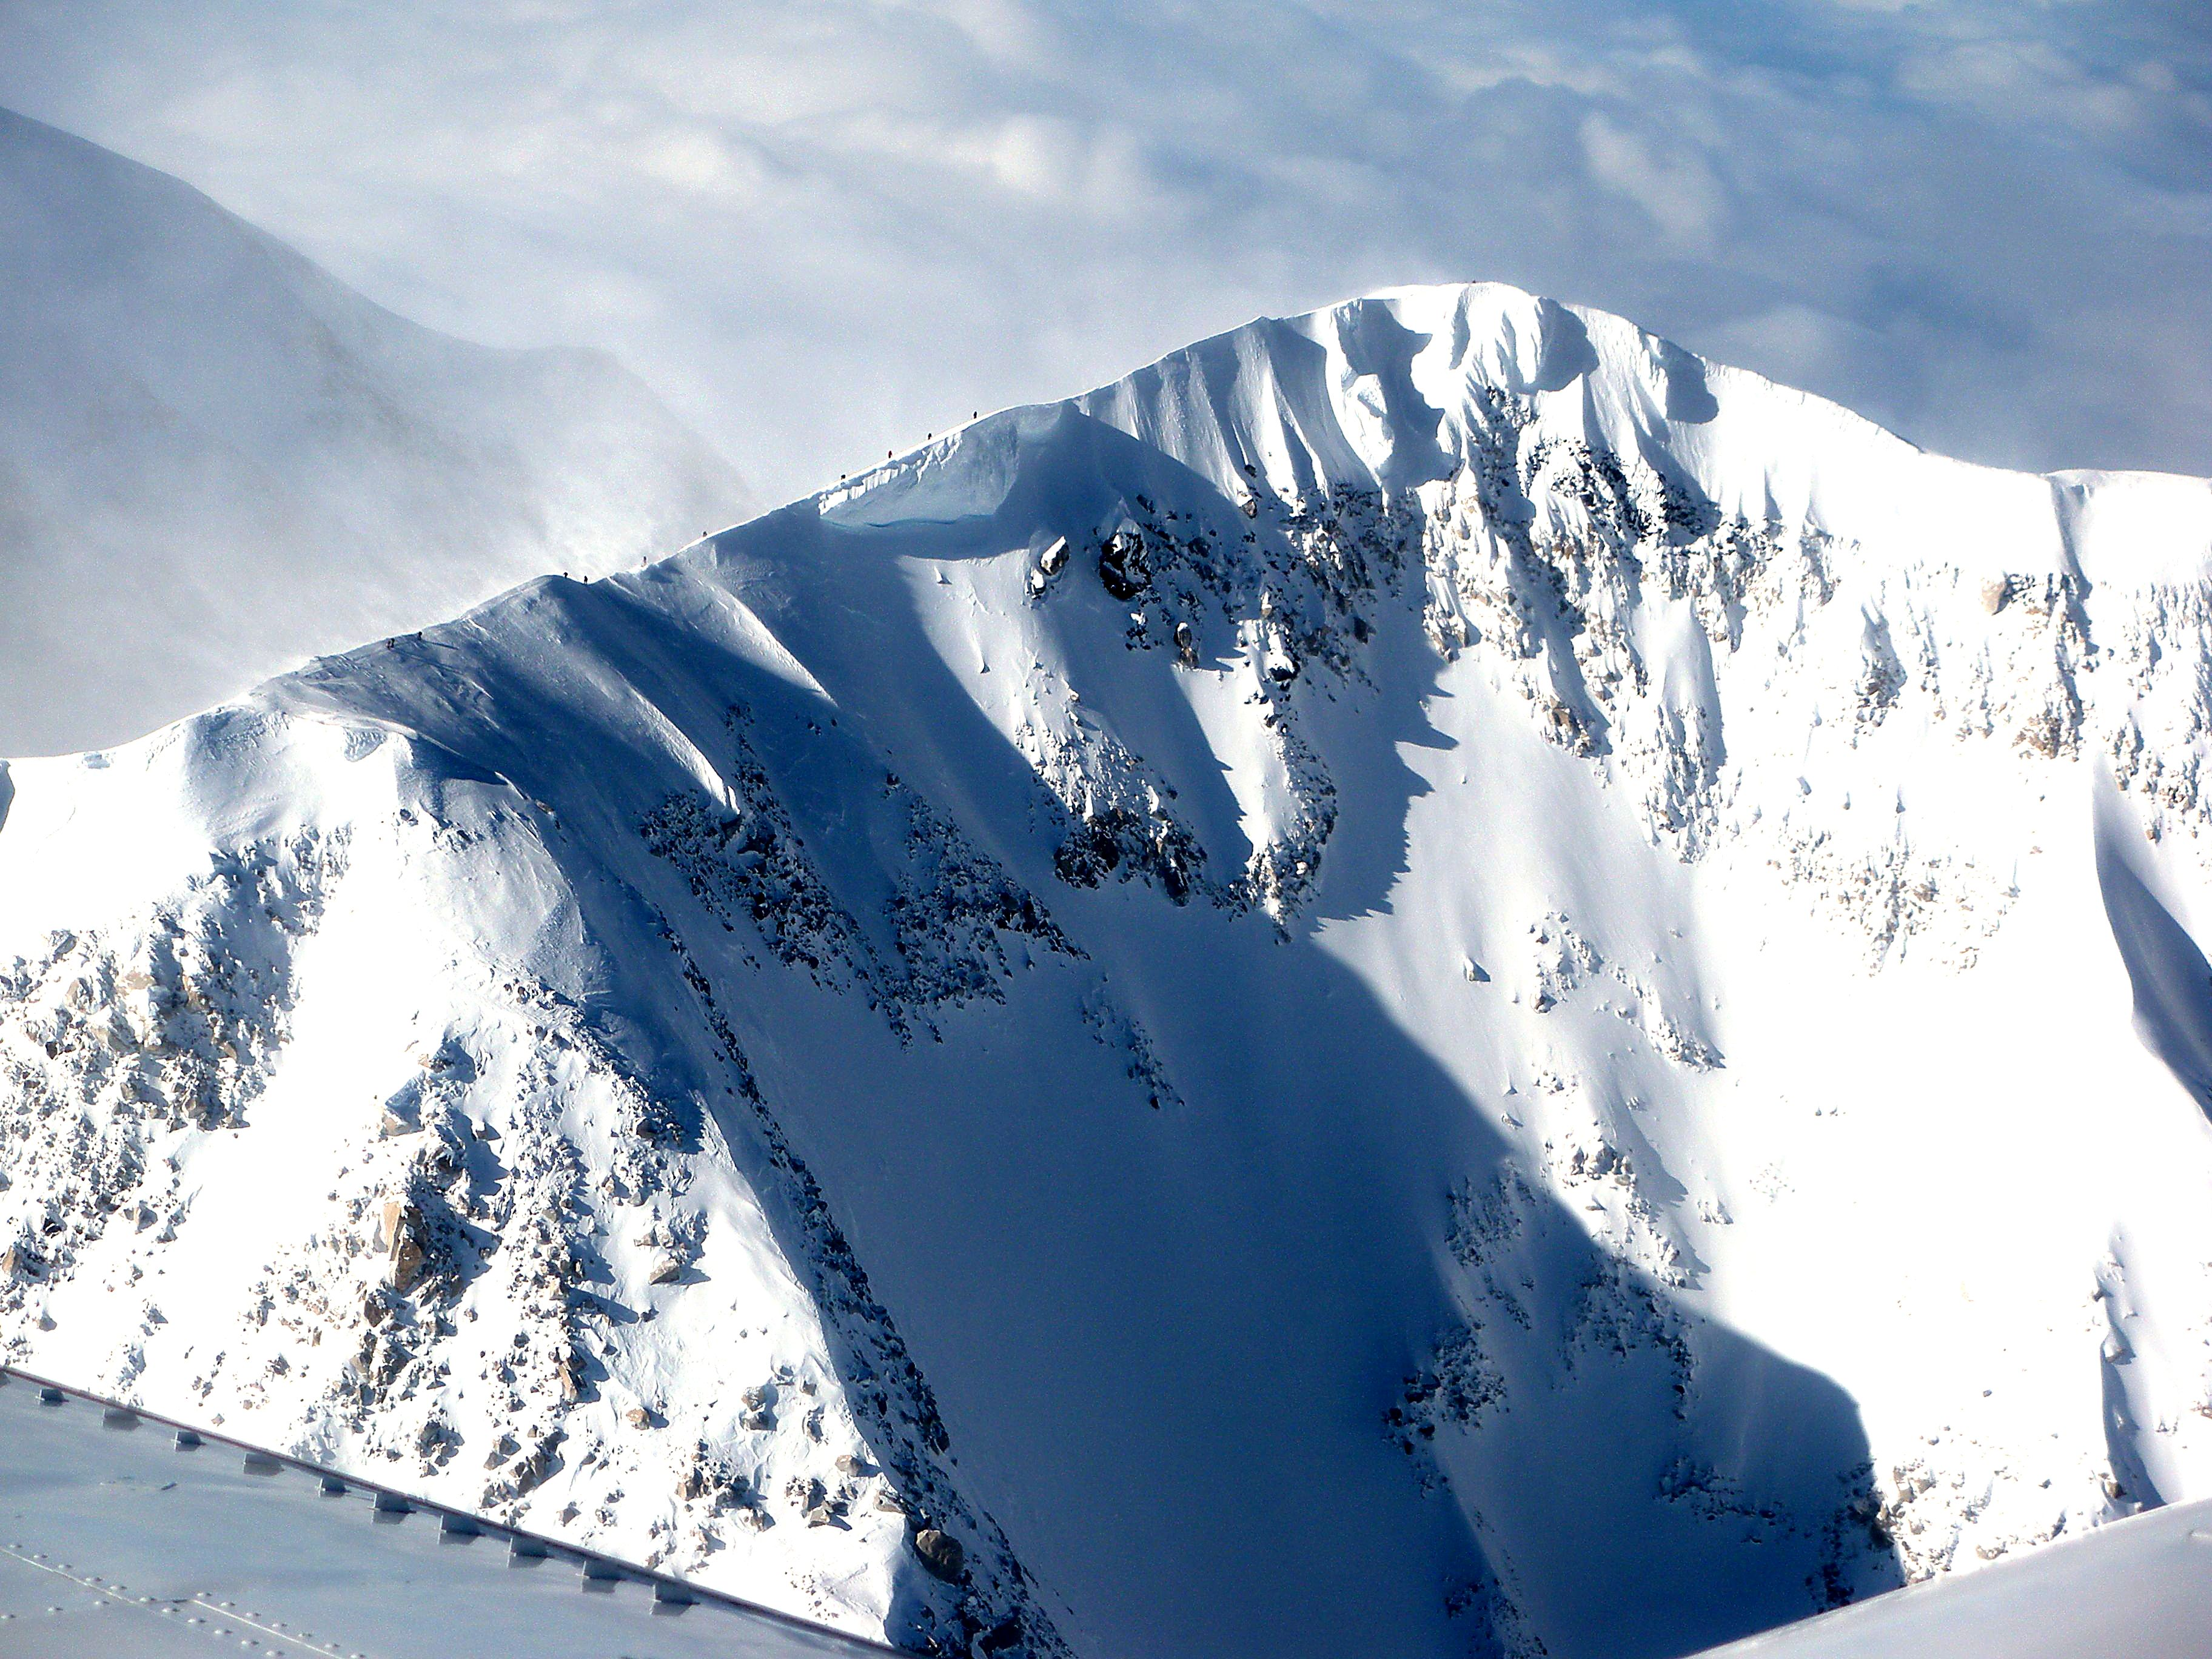 Mount Denali, formerly Mount McKinley